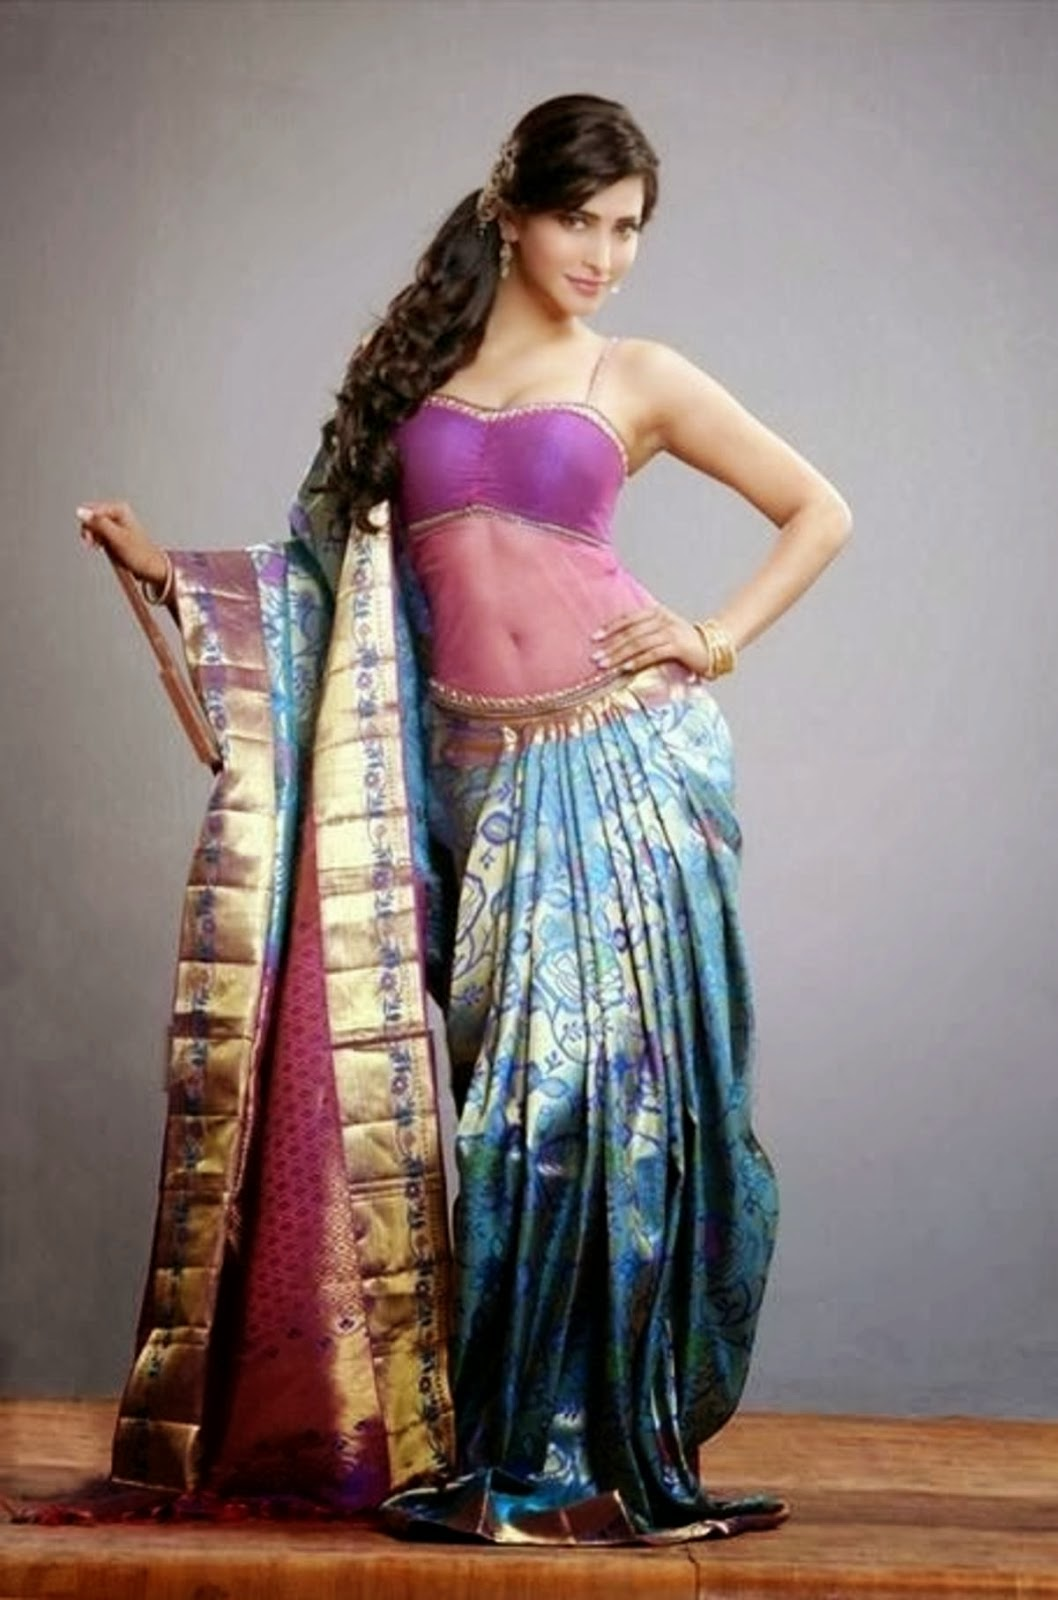 Shruti Haasan looking like a Goddess in Fancy Saree